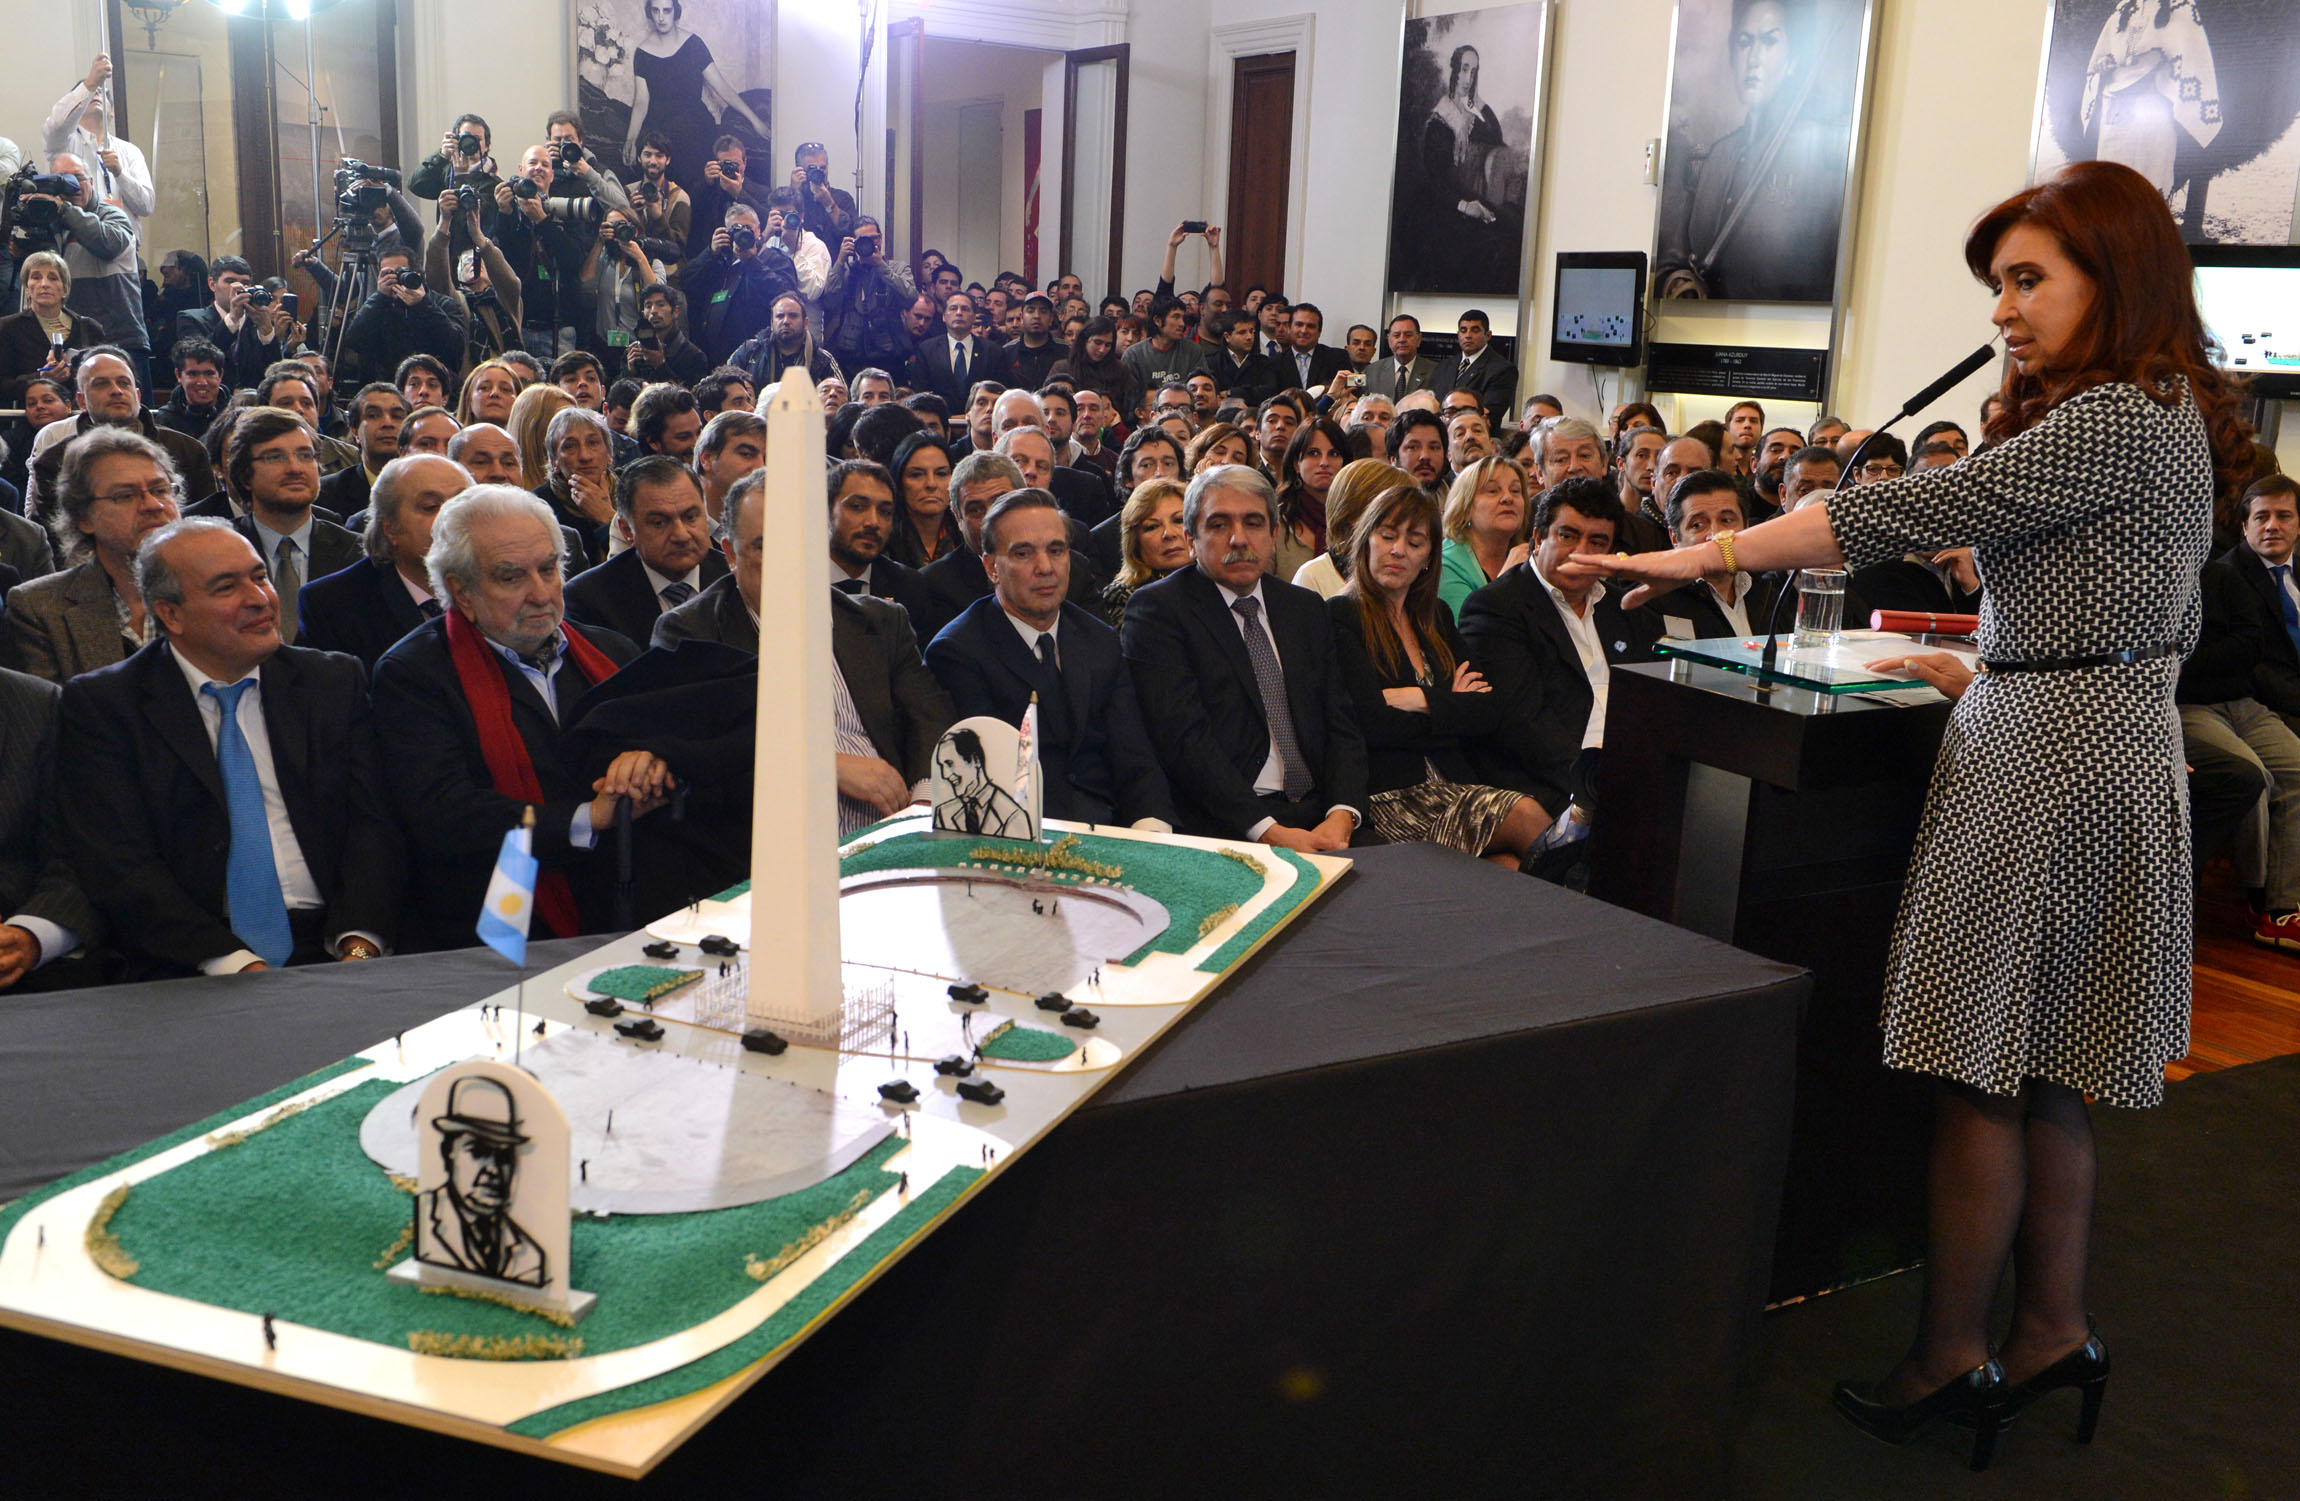 Homenaje de Cristina Kirchner a Pern e Yrigoyen  Cristina Fernandez de Kirchner